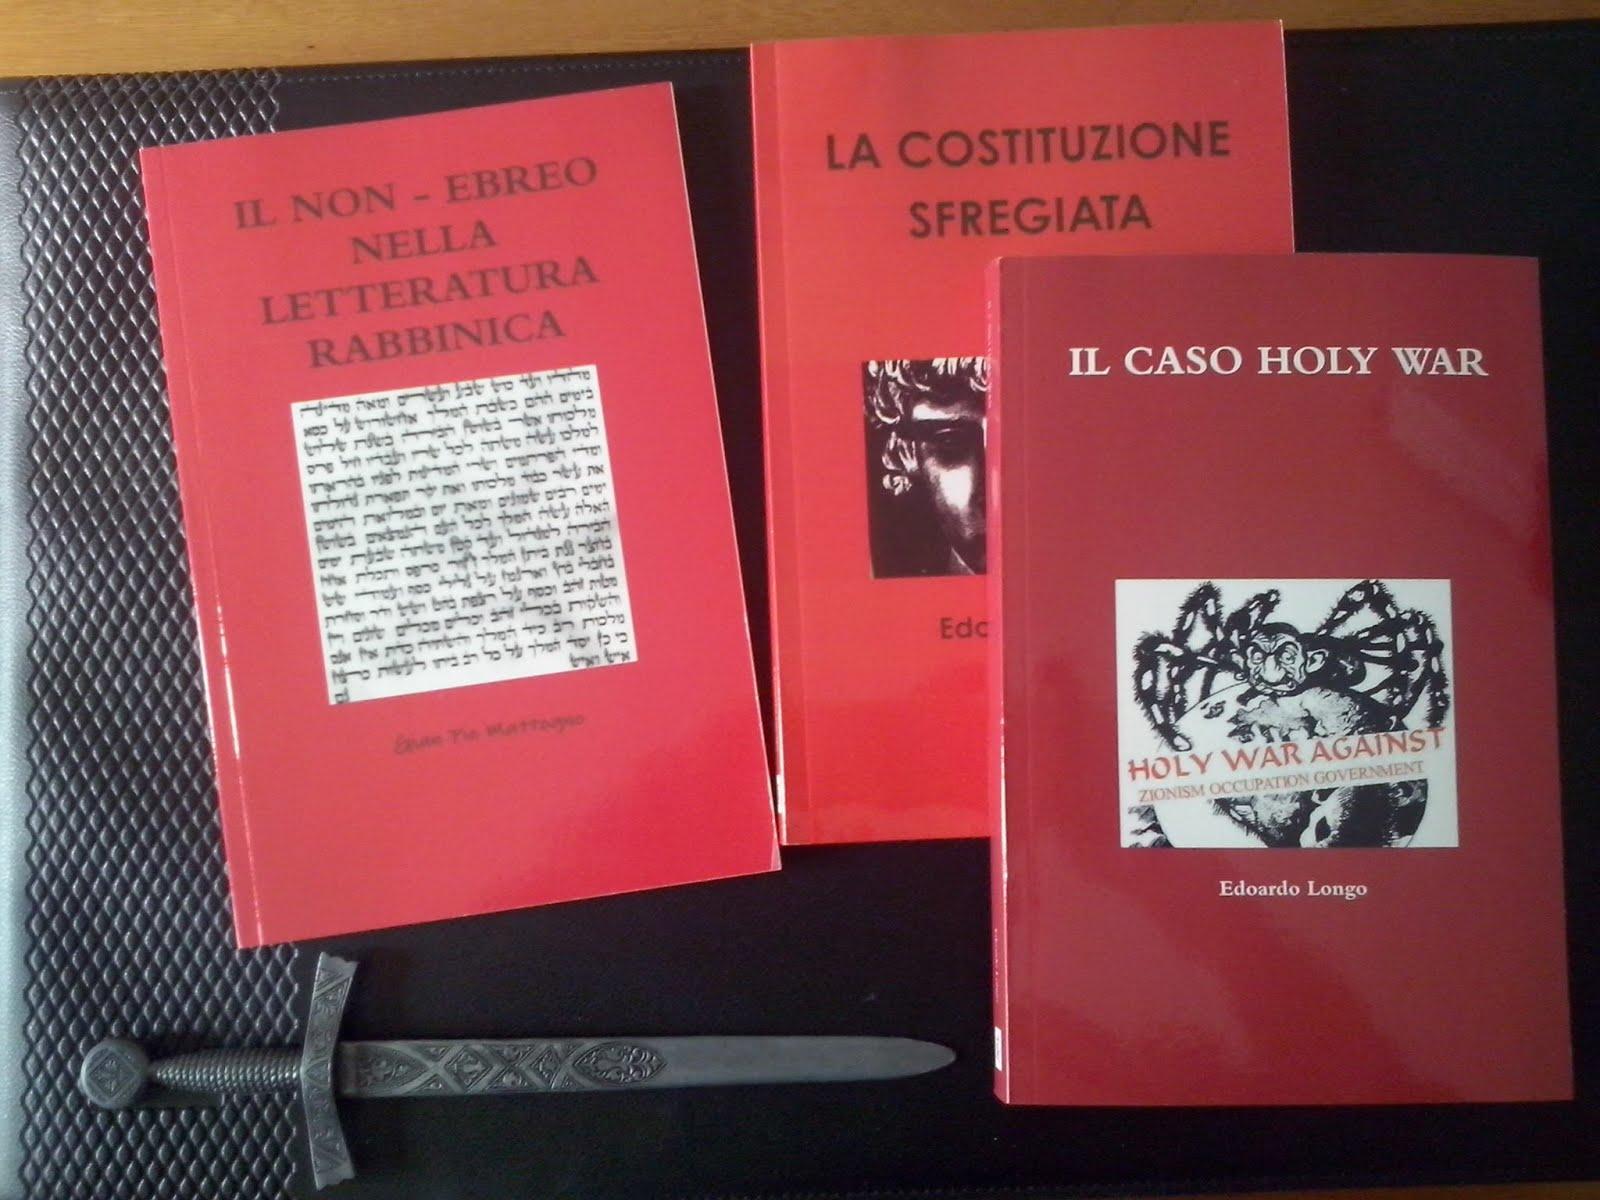 LIBRI SUL CASO HOLY WAR